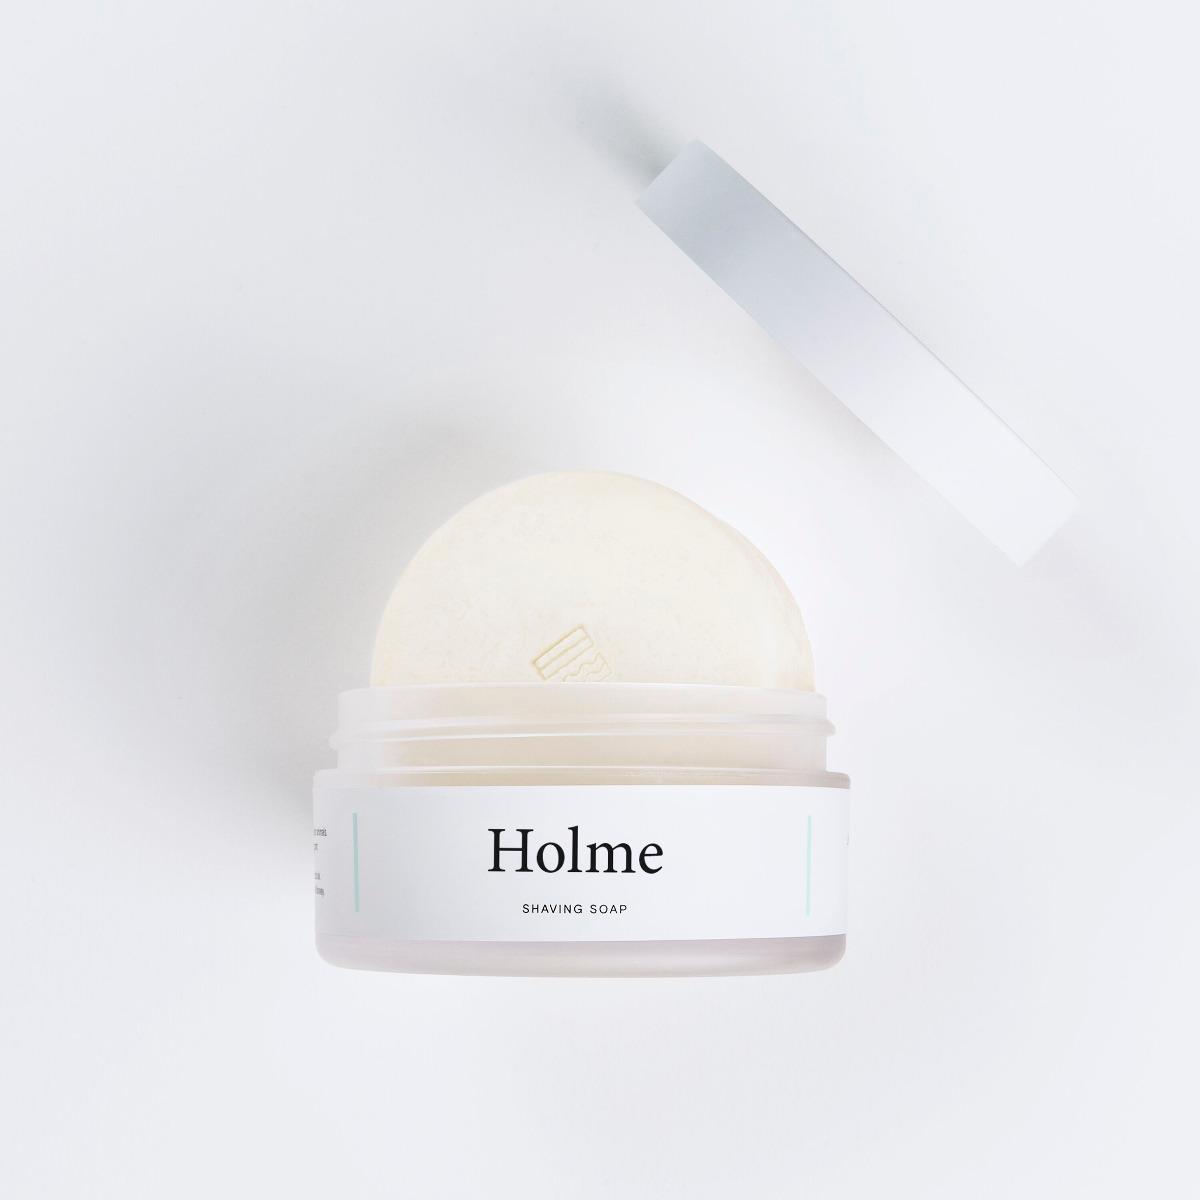 Fitjar Islands Holme Shaving Soap 100g in Plastic Tub